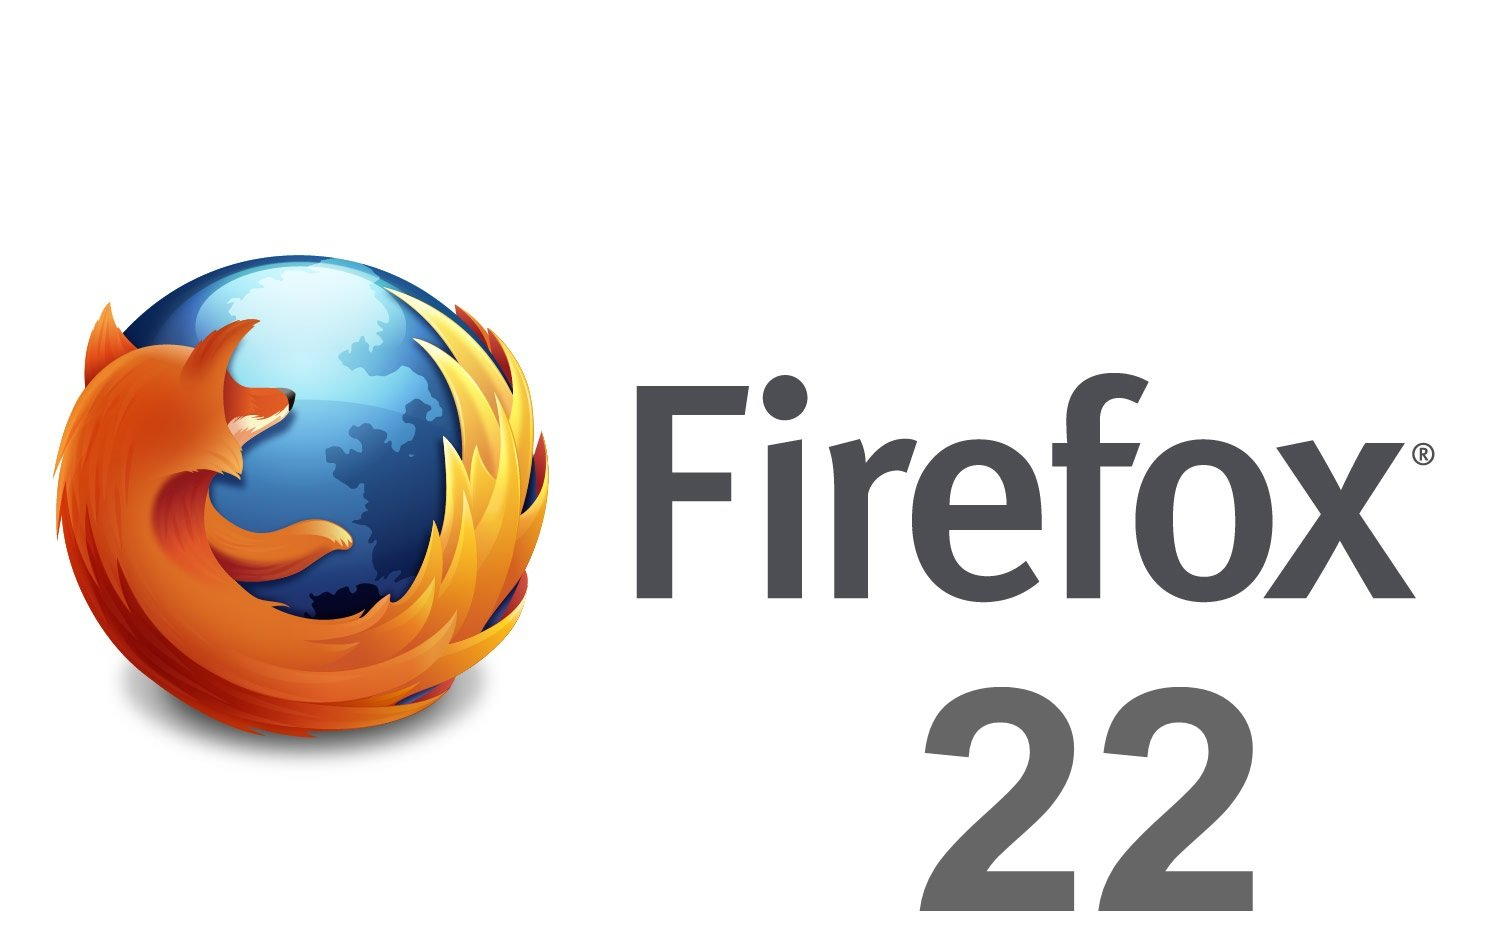 firefox logo wordmark horiz rgb1 - Firefox 22 steht zum Download bereit